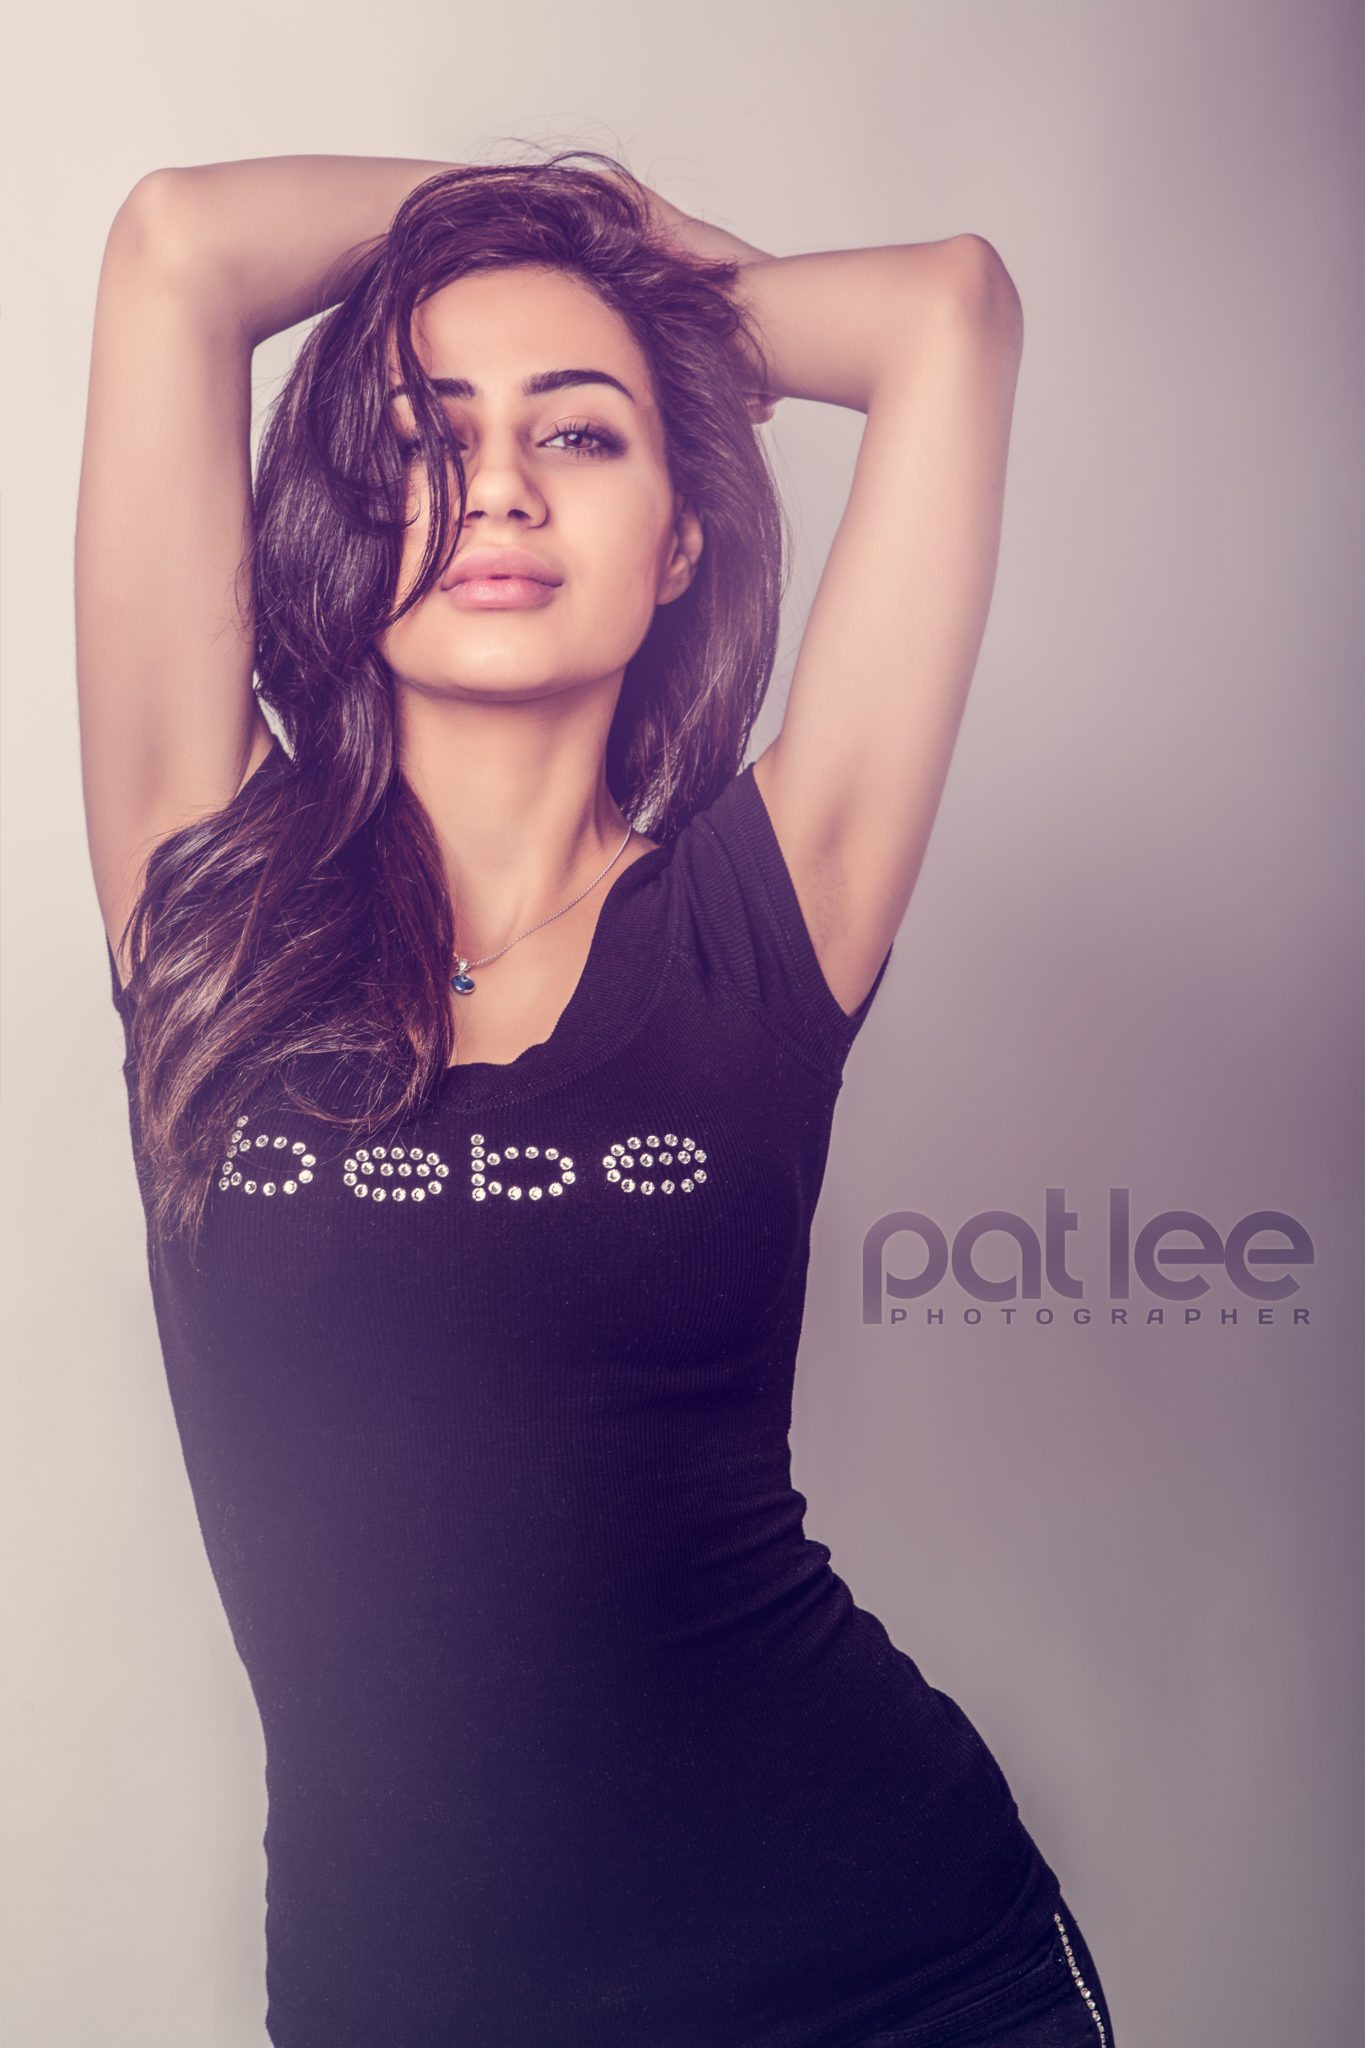 Pat Lee | Portfolio: Women